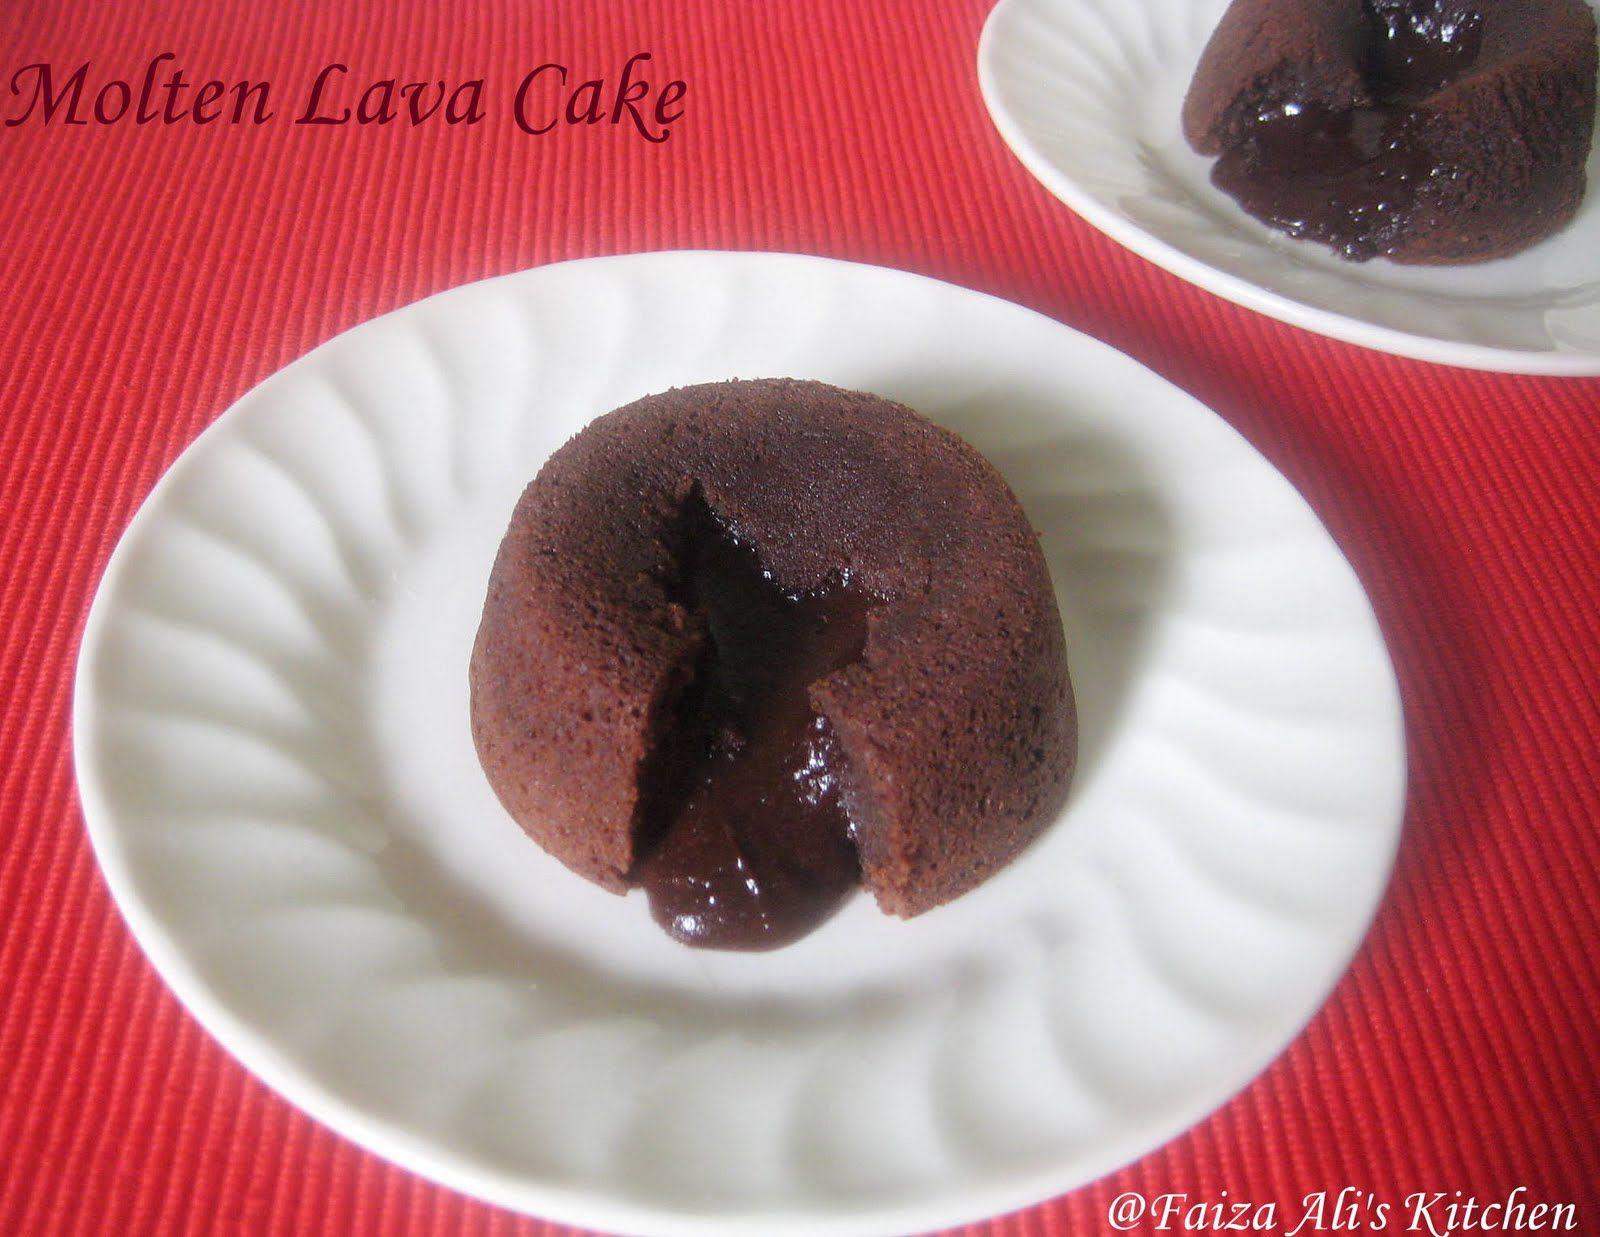 Charmant Faiza Aliu0027s Kitchen: Molten Lava Cake